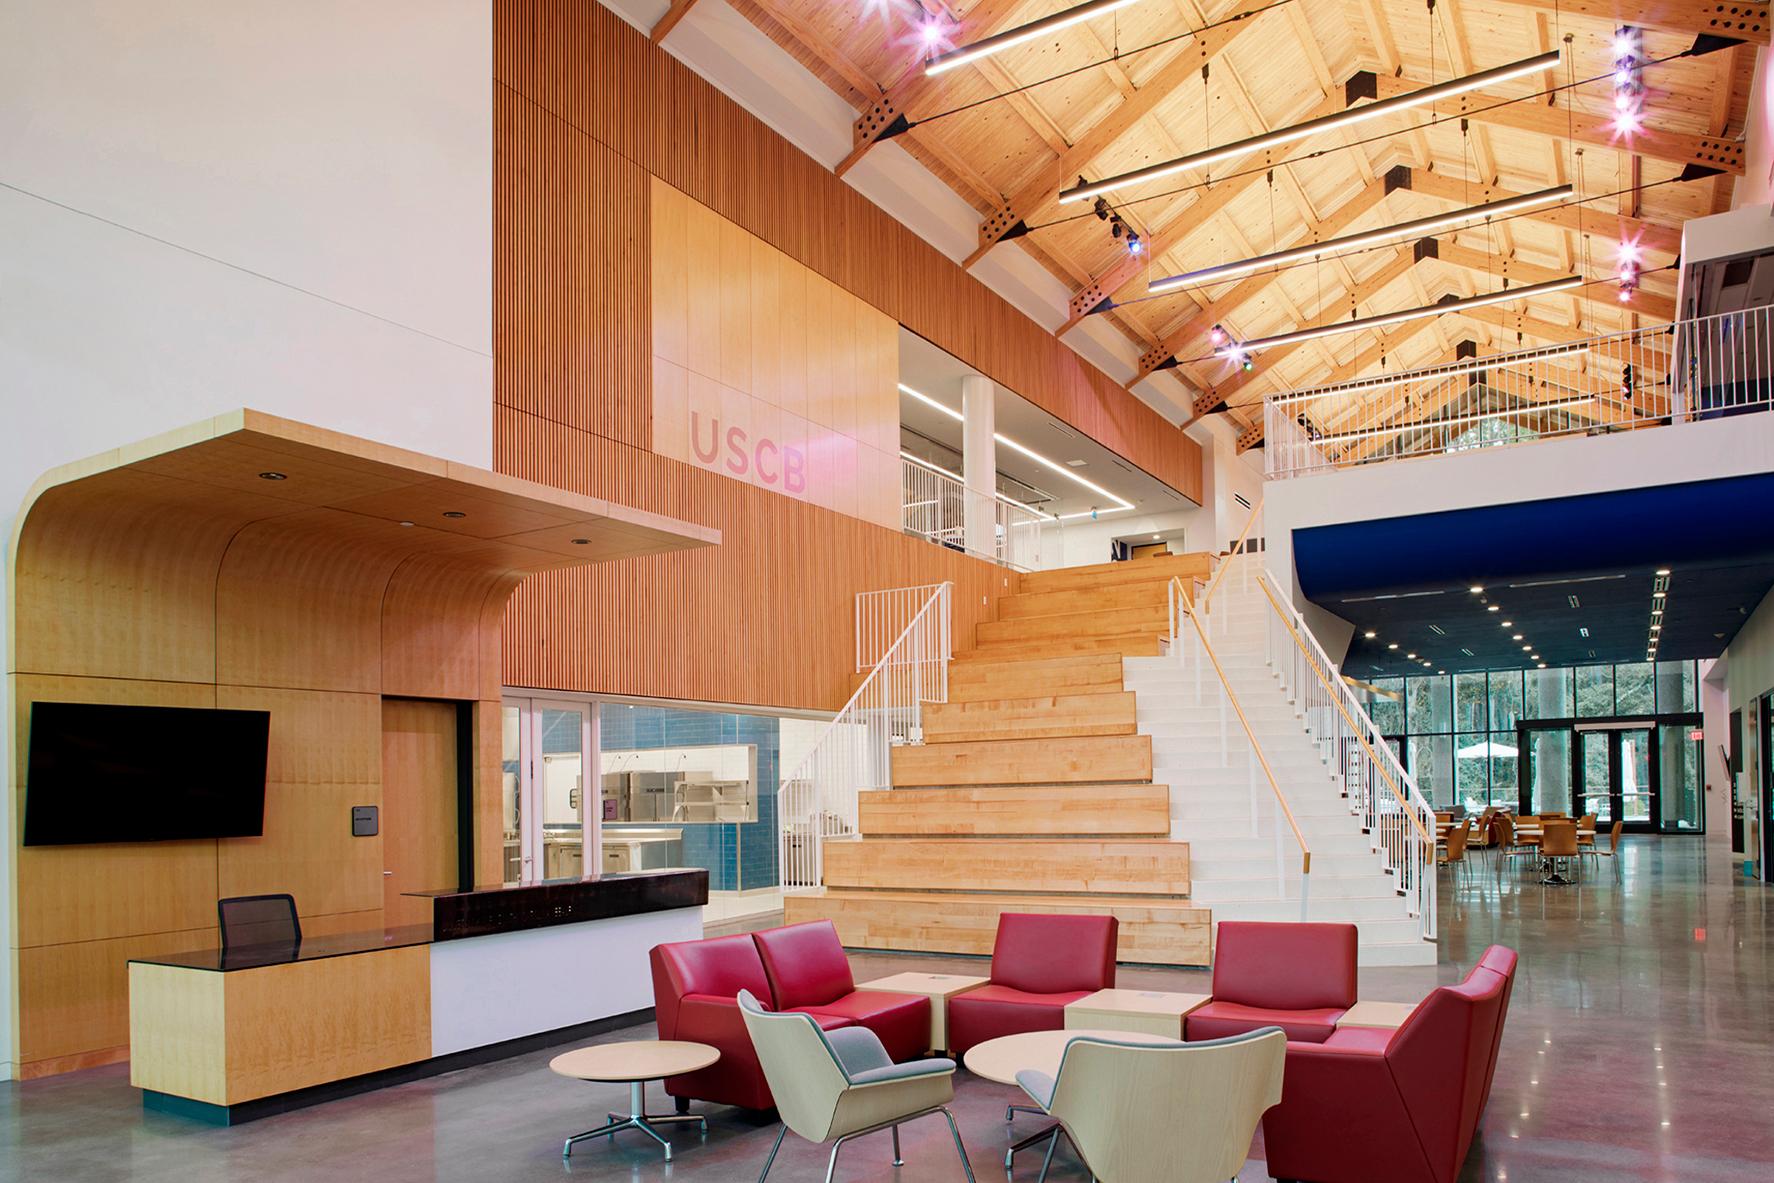 University of South Carolina Beaufort<br>Hospitality Management Center